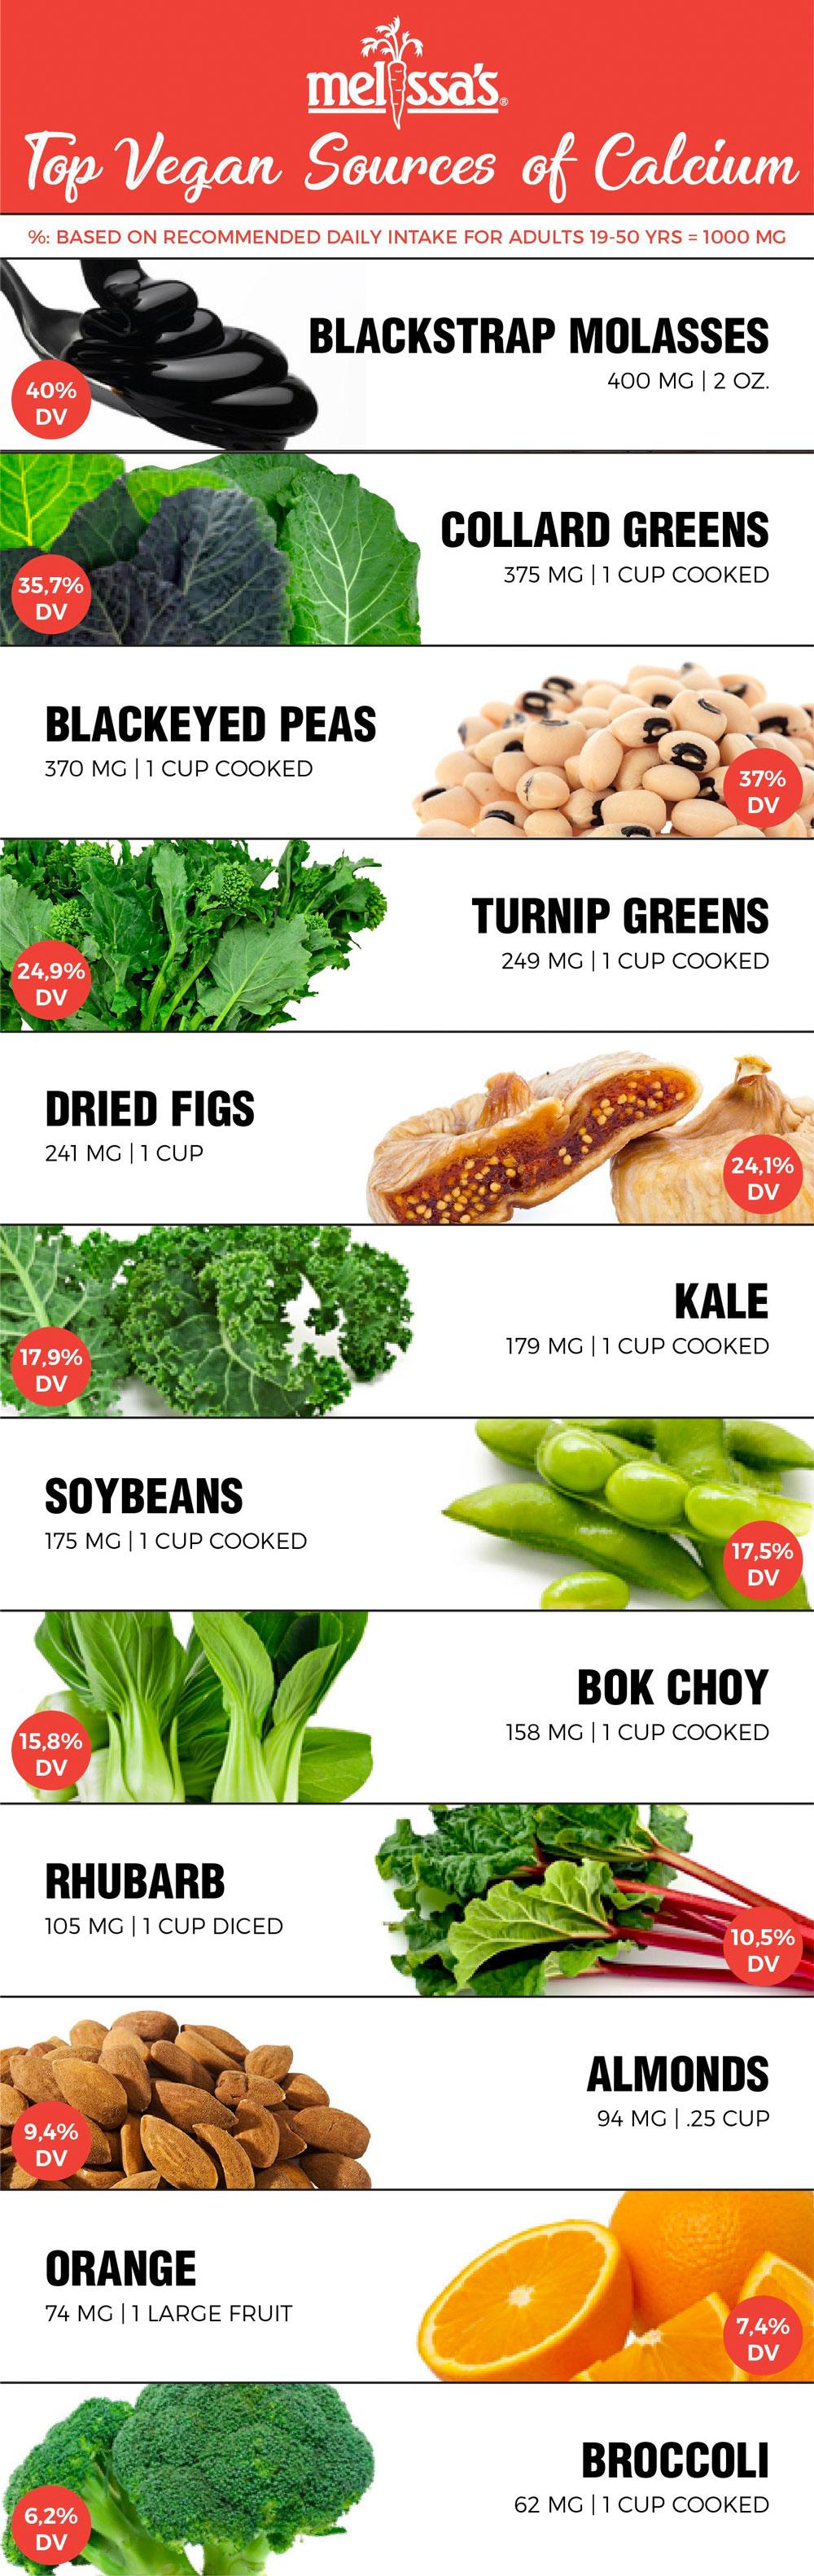 updated-version-of-top-vegan-sources-of-calcium